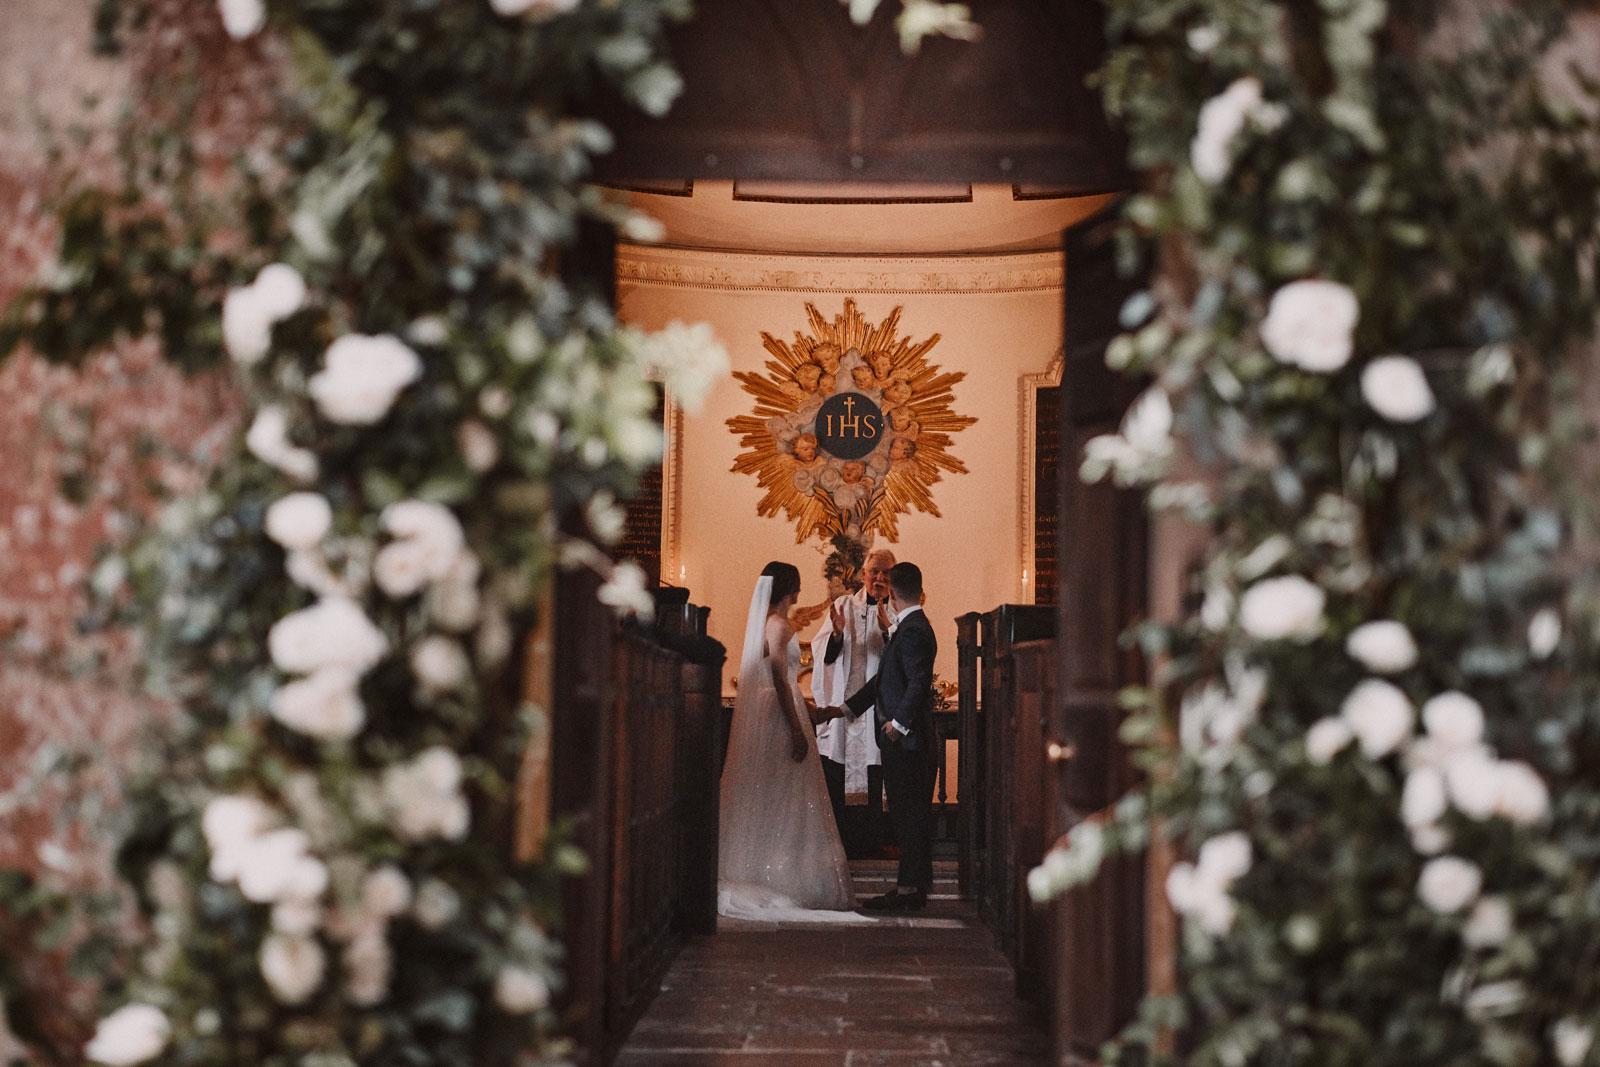 Ceremony, Wedding Ceremony, Wedding Service, Wedding, Weddings, Bride and Groom, Husband and Wife, Aisle Style